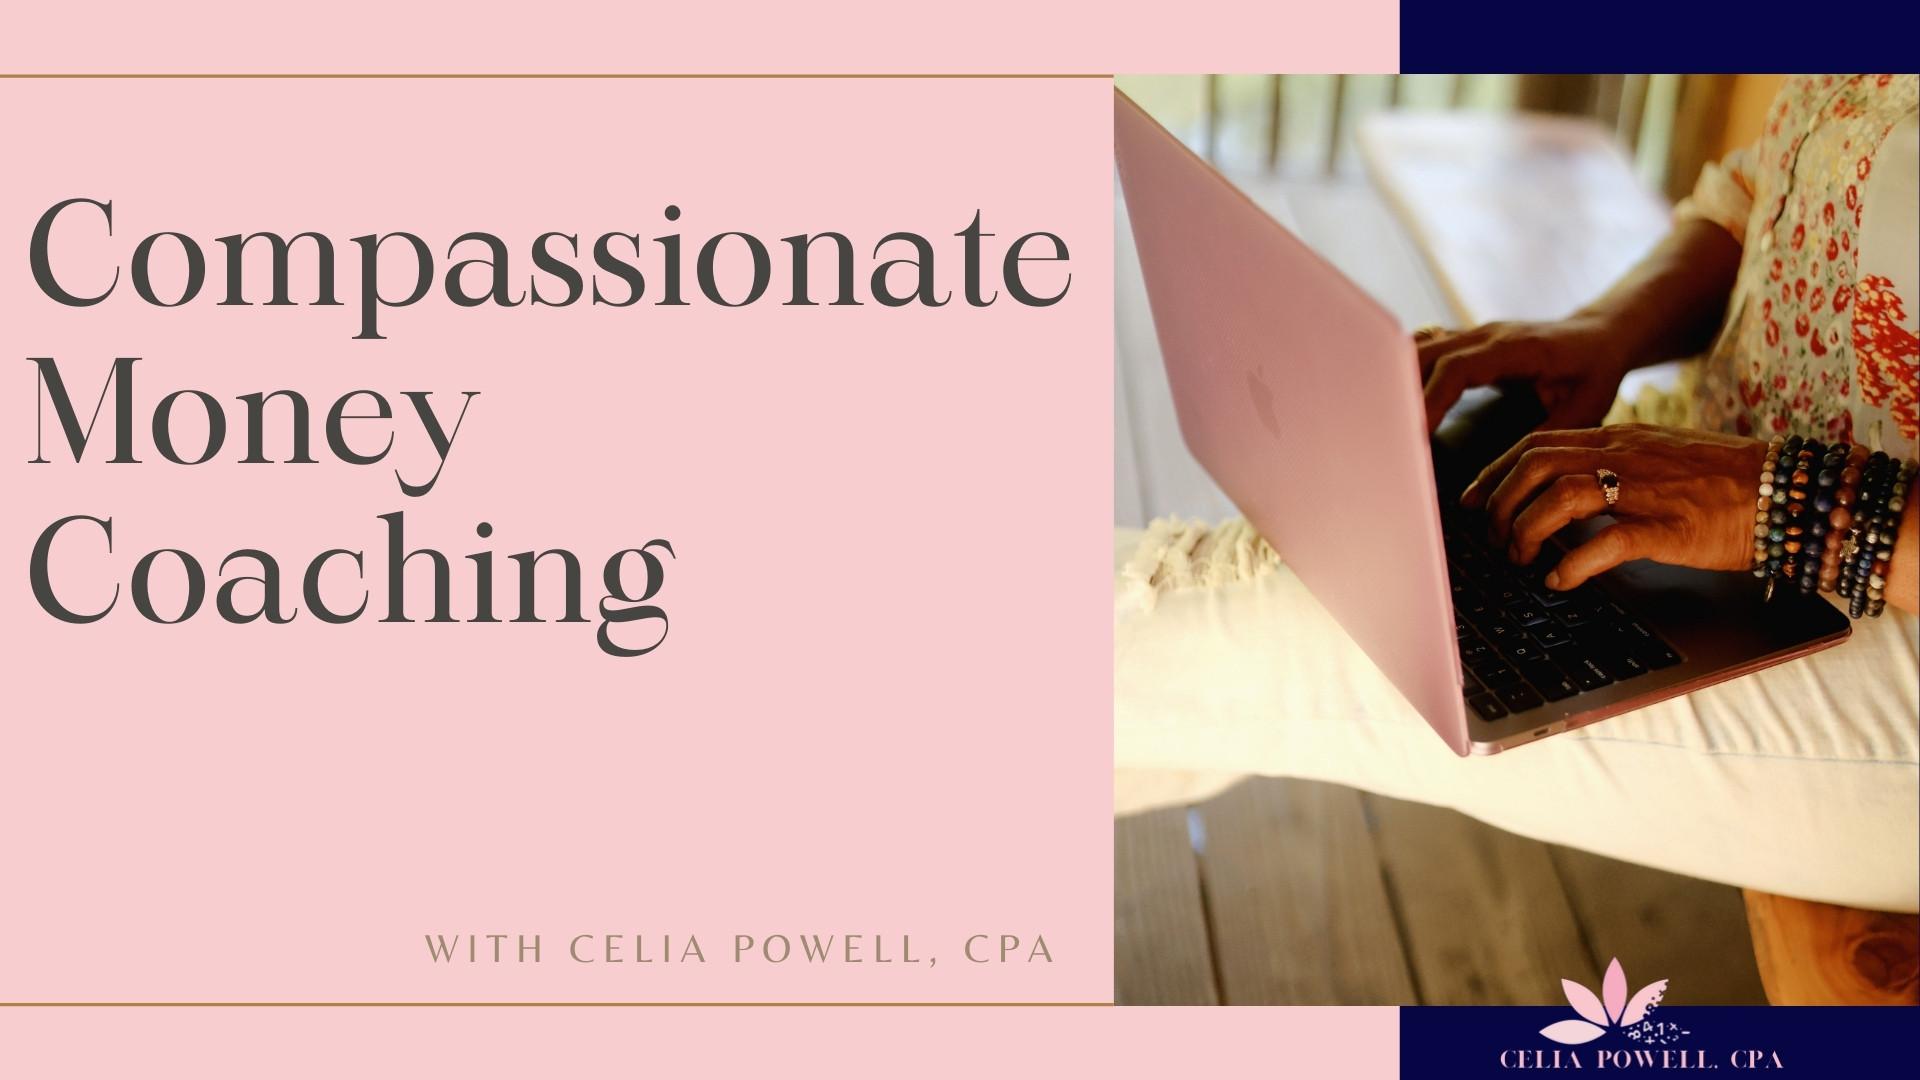 Compassionate Money Coaching I